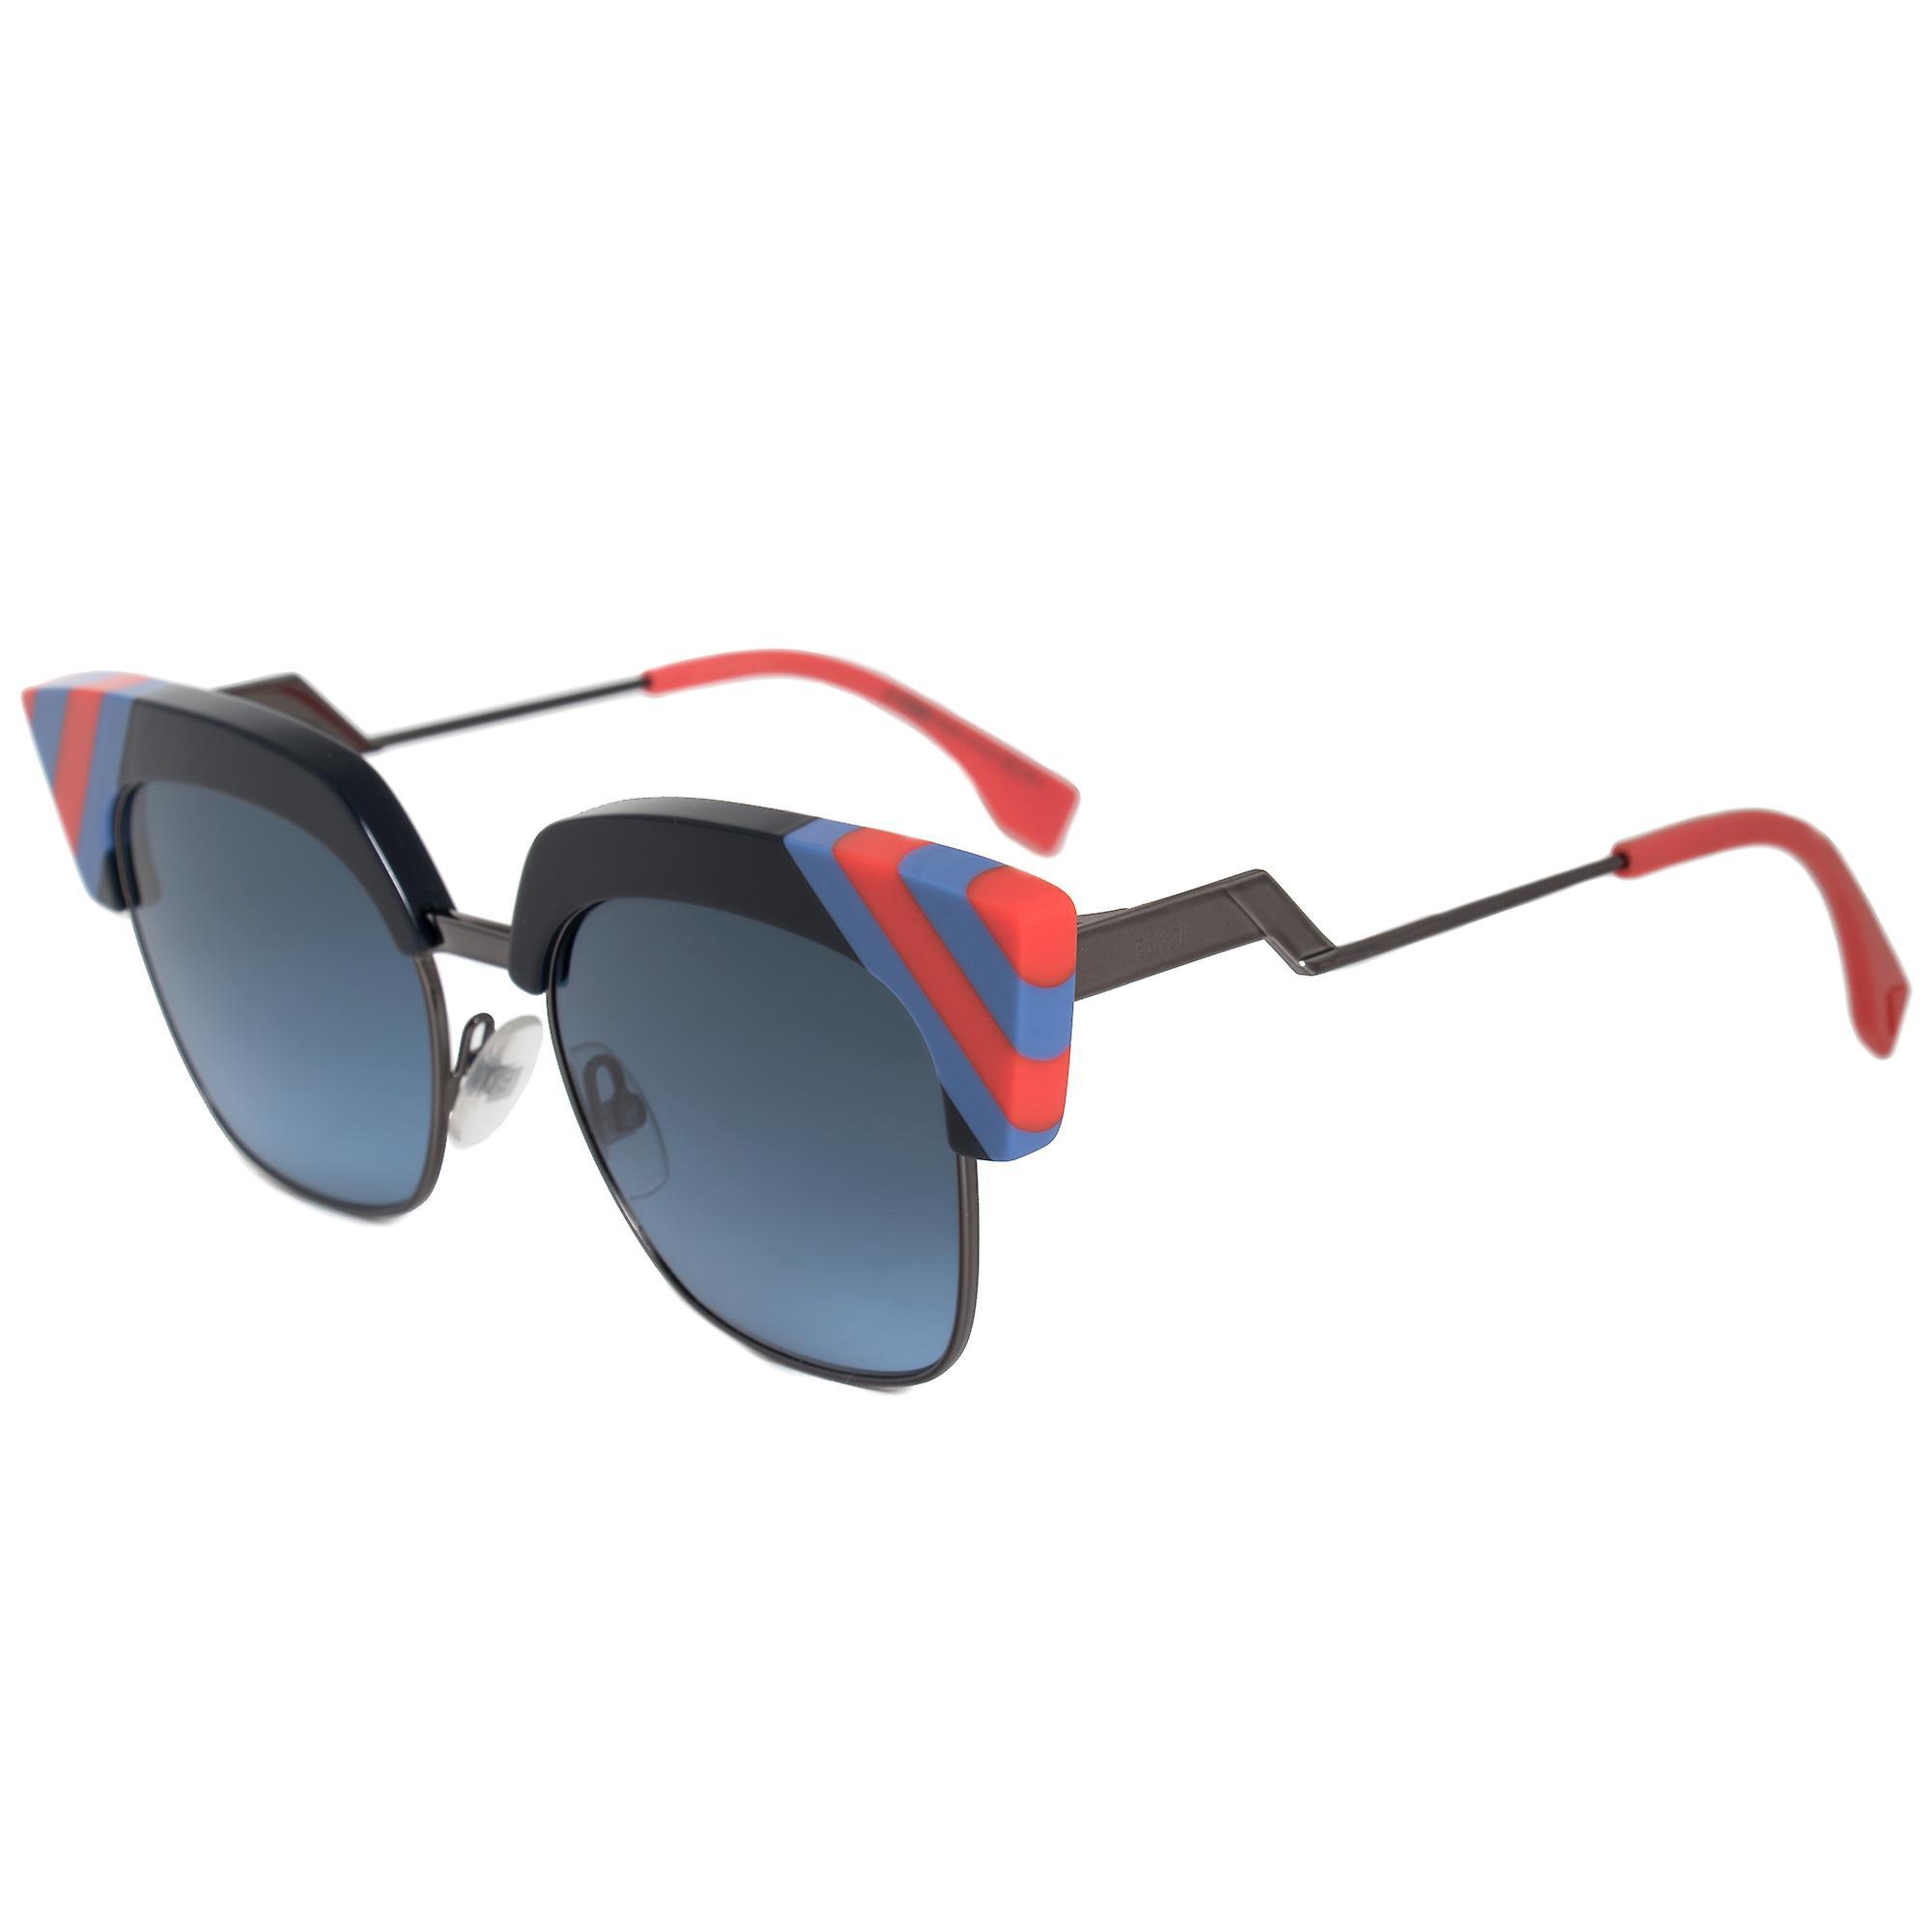 Fendi Waves Square Sunglasses FF0241S PJP 08 50